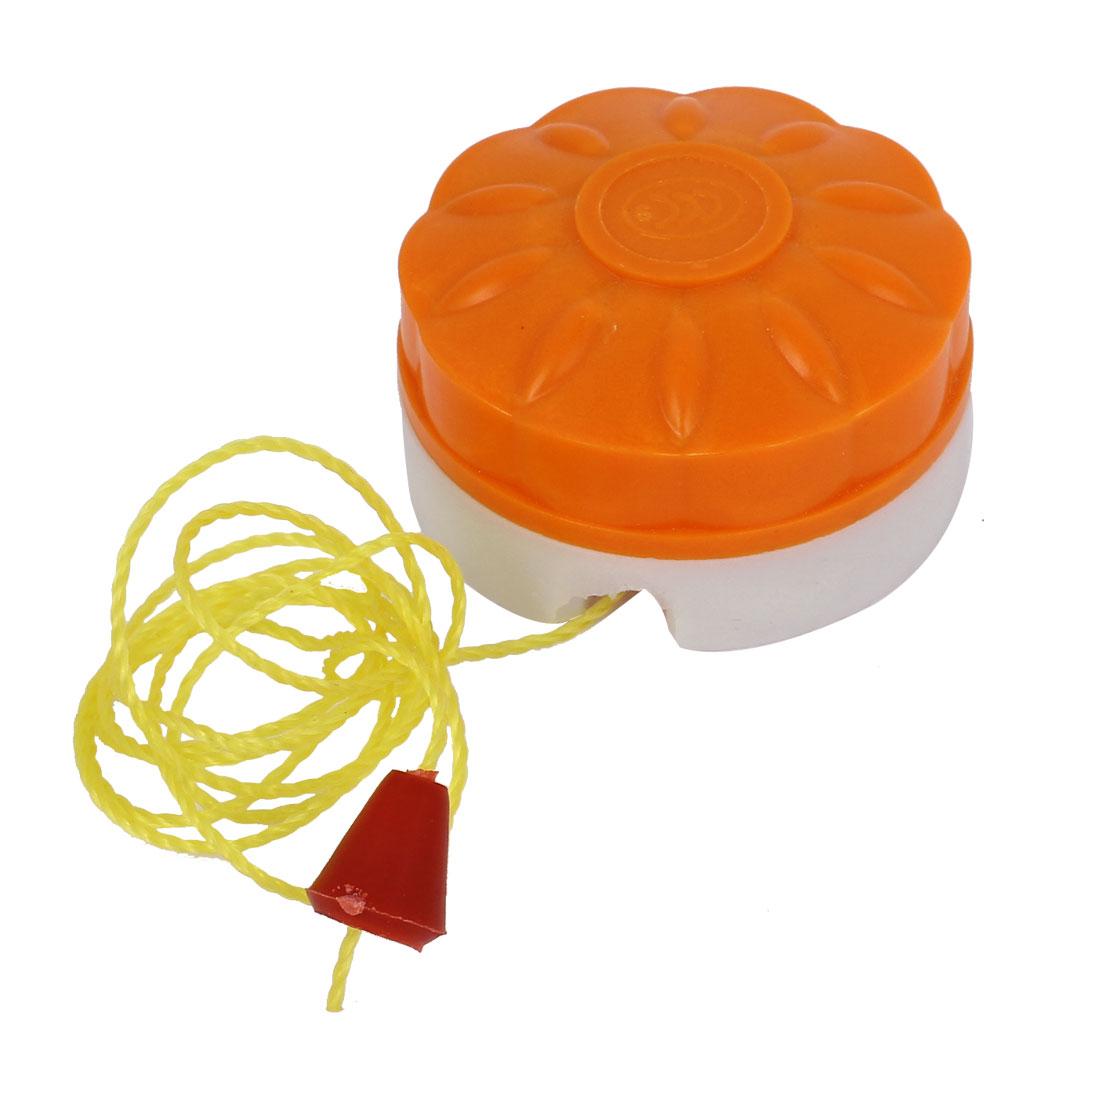 AC250V 6A Round Style Bathroom Fan String Light Lamp Pull Cord Switch Orange